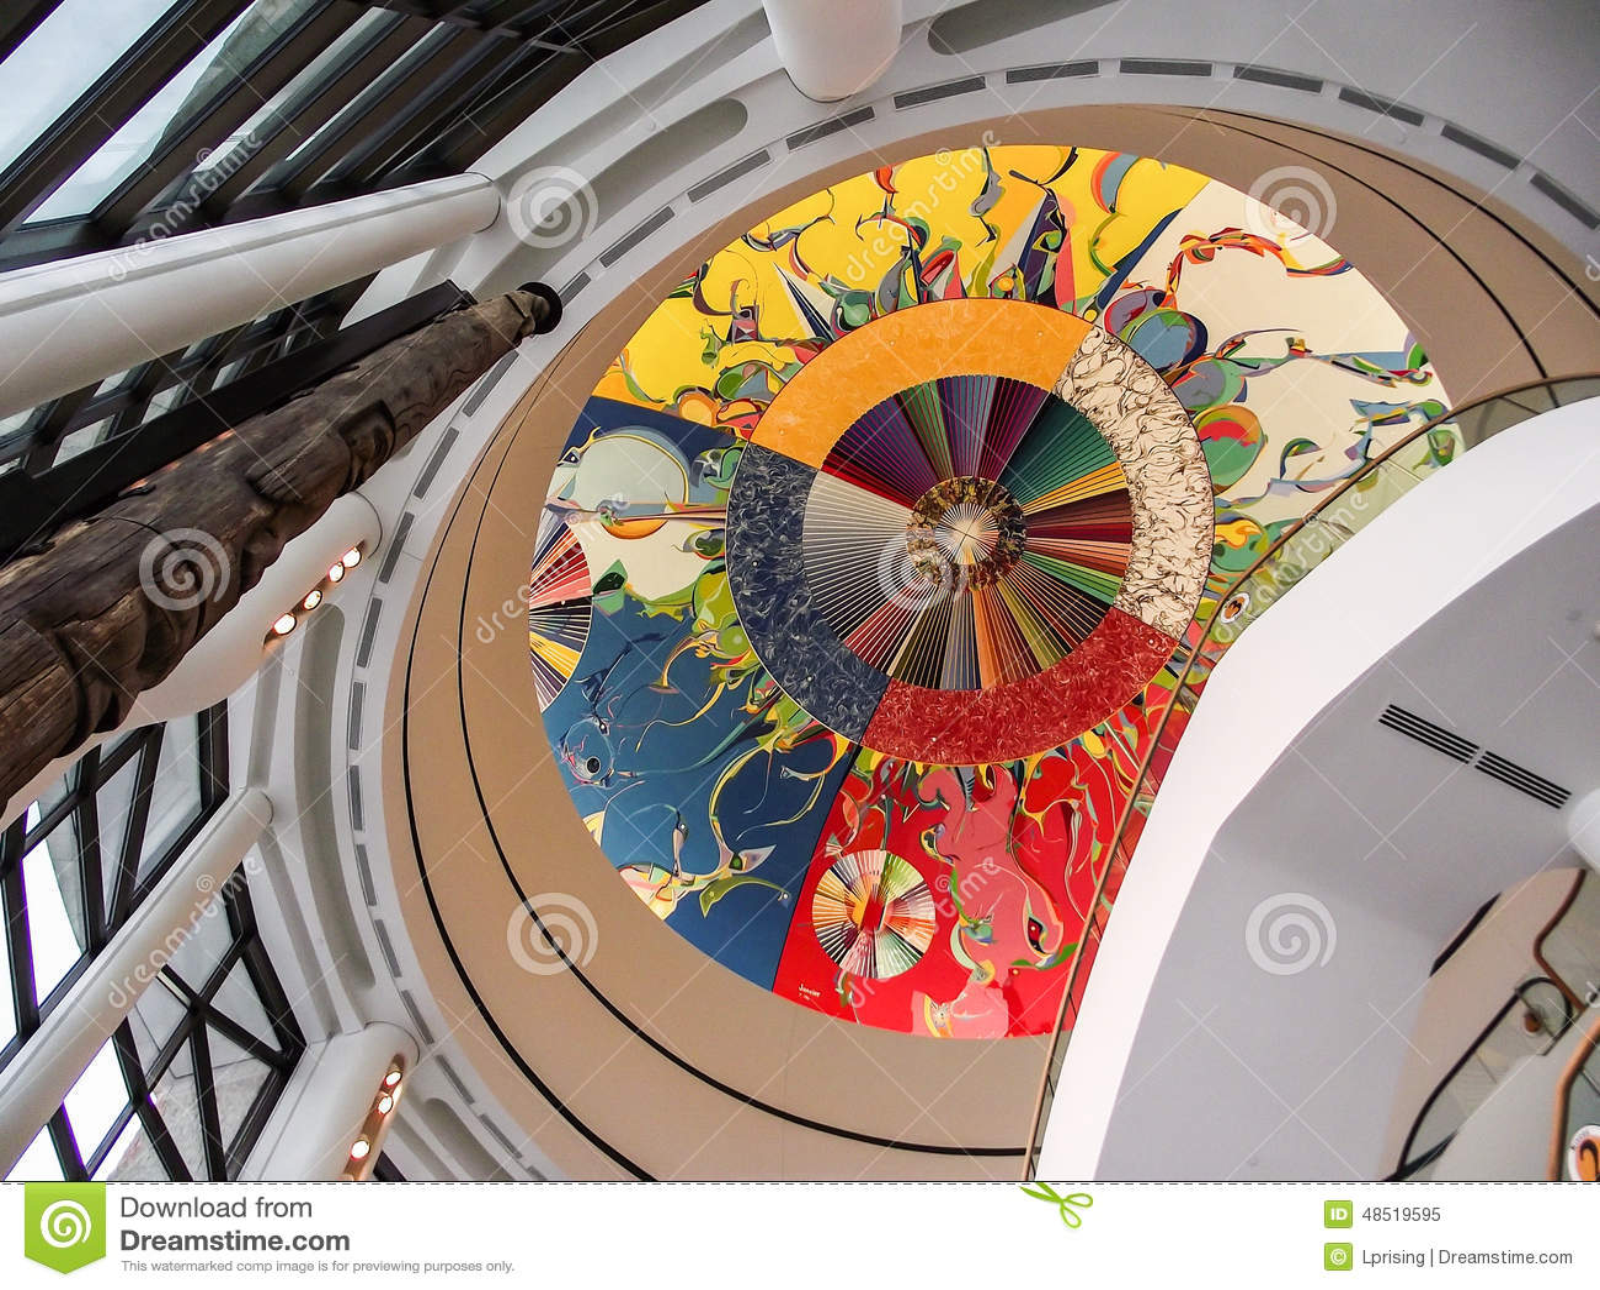 Ceiling Art Stock Photo Image 48519595